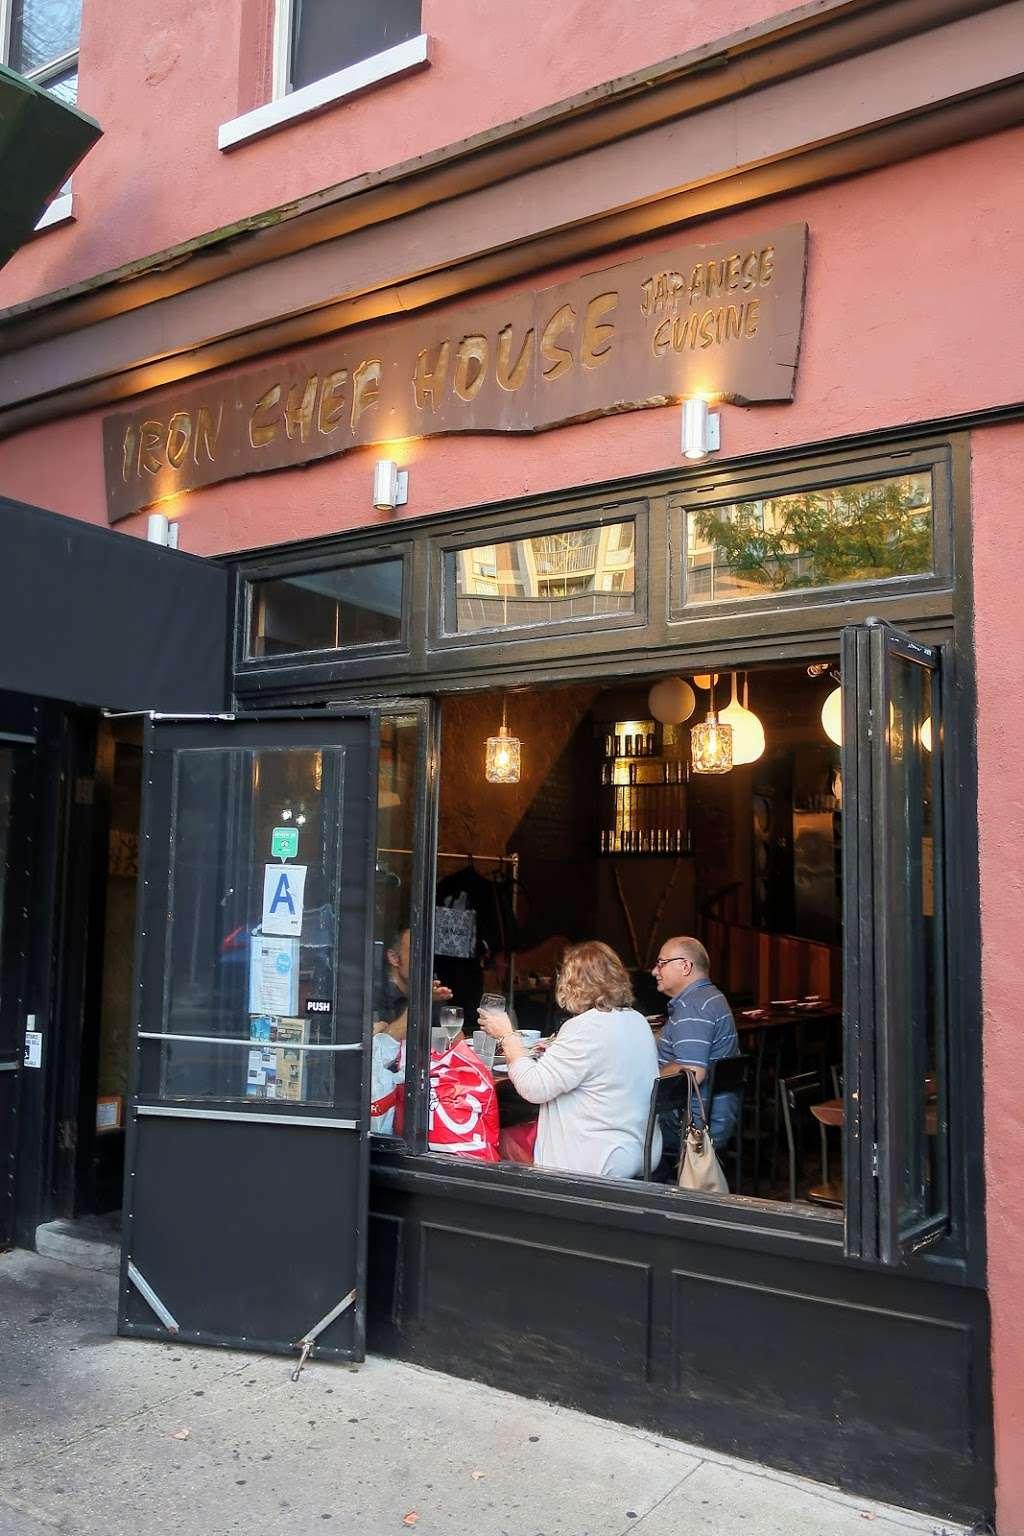 Iron Chef House - restaurant  | Photo 3 of 10 | Address: 92 Clark St, Brooklyn, NY 11201, USA | Phone: (718) 858-8517